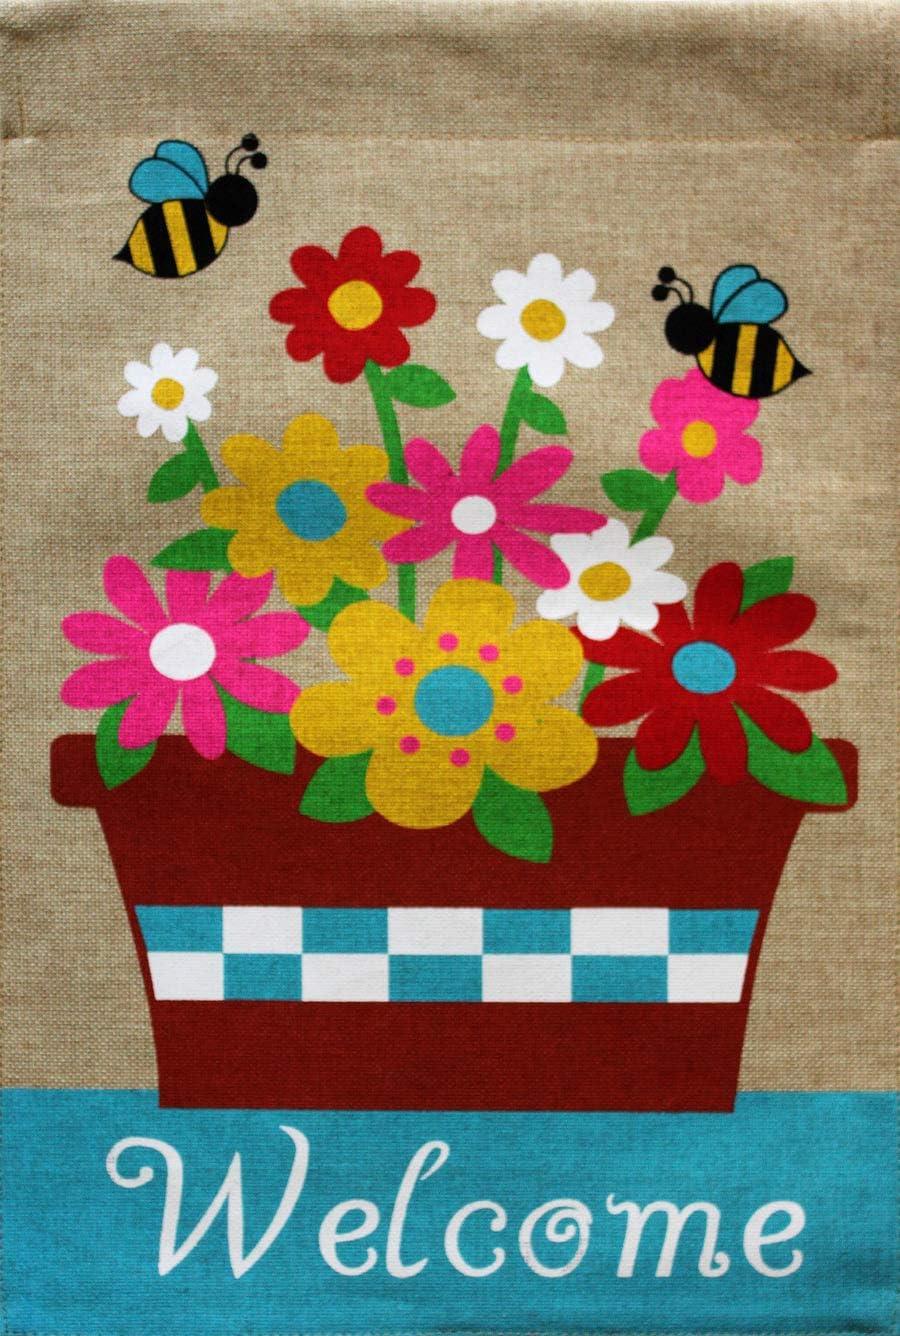 "Briarwood Lane Springtime Floral Burlap Garden Flag Welcome Flower Pot 12.5"" x 18"""